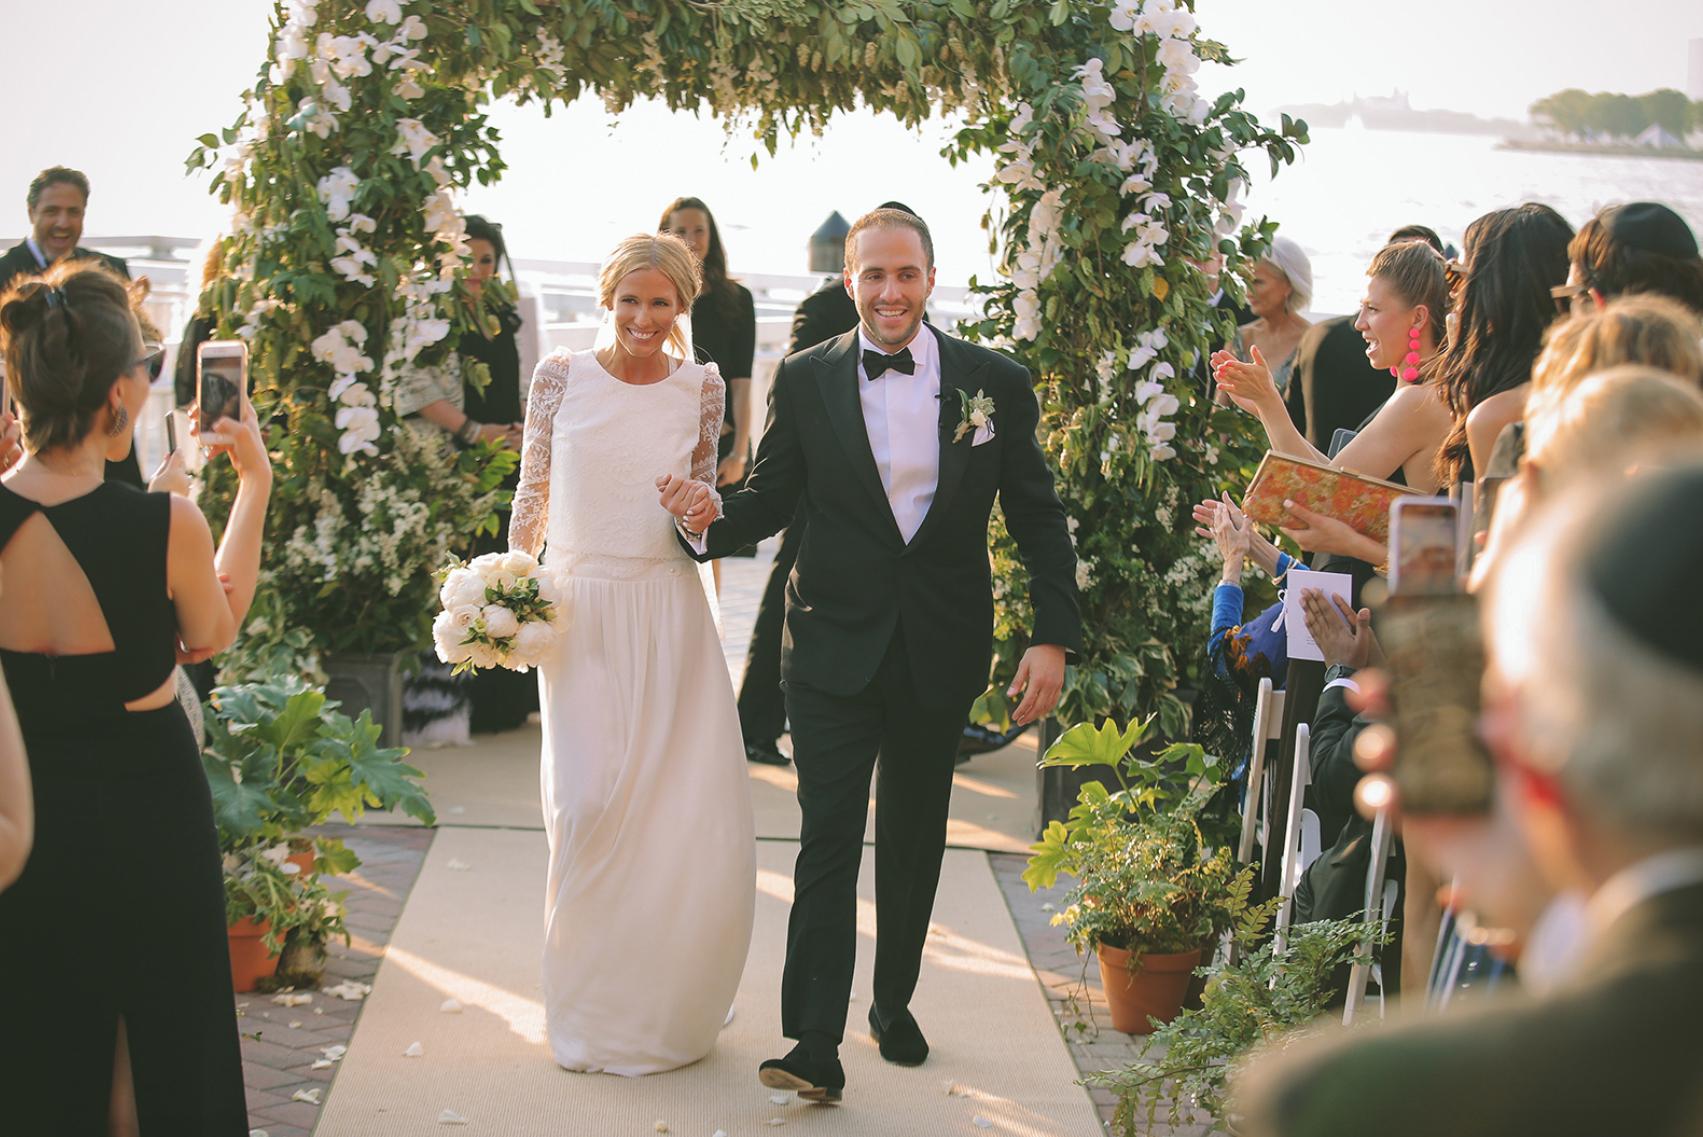 wedding-aisle-decor